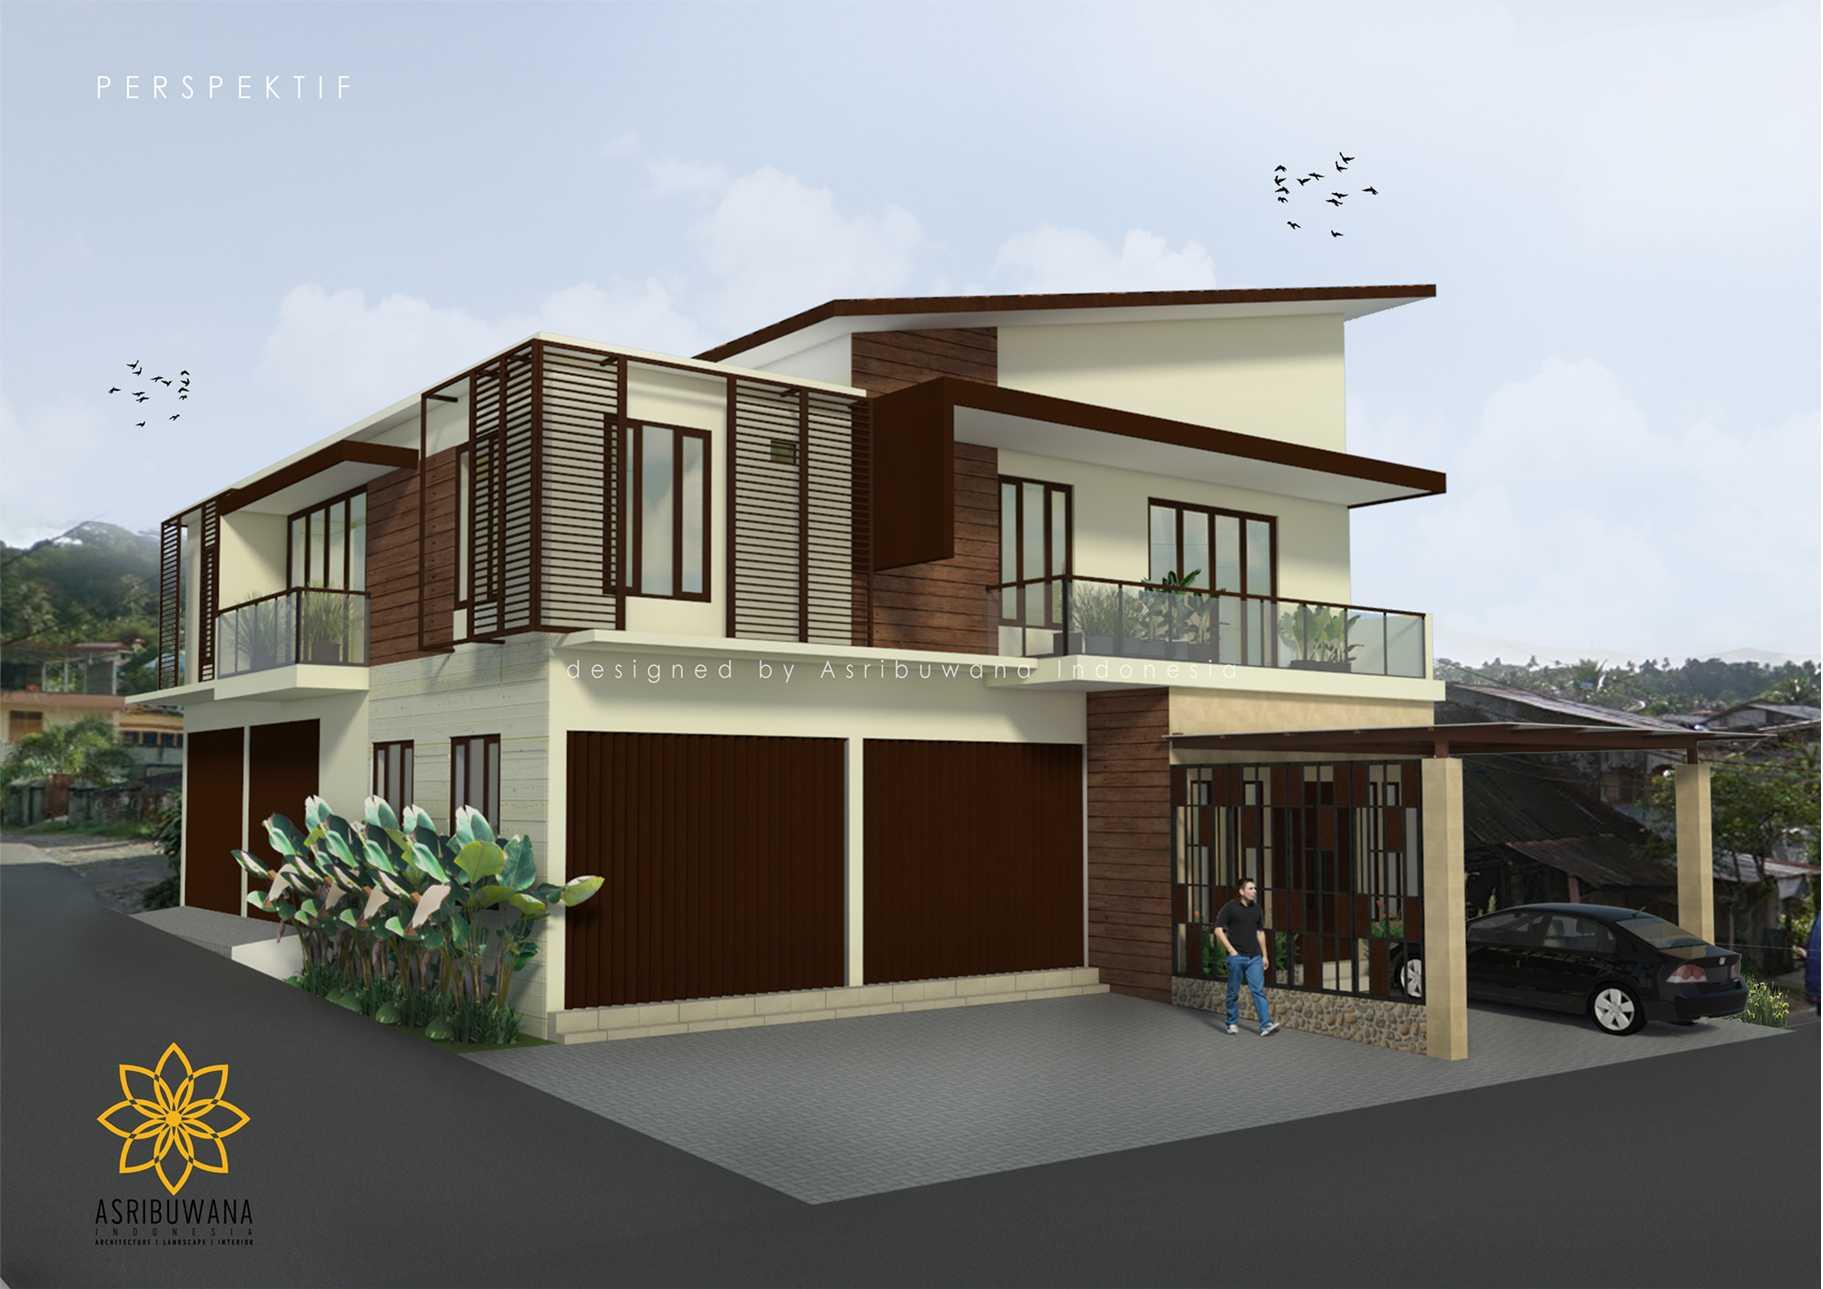 Jasa Design and Build Asribuwana Indonesia di Gunungsitoli